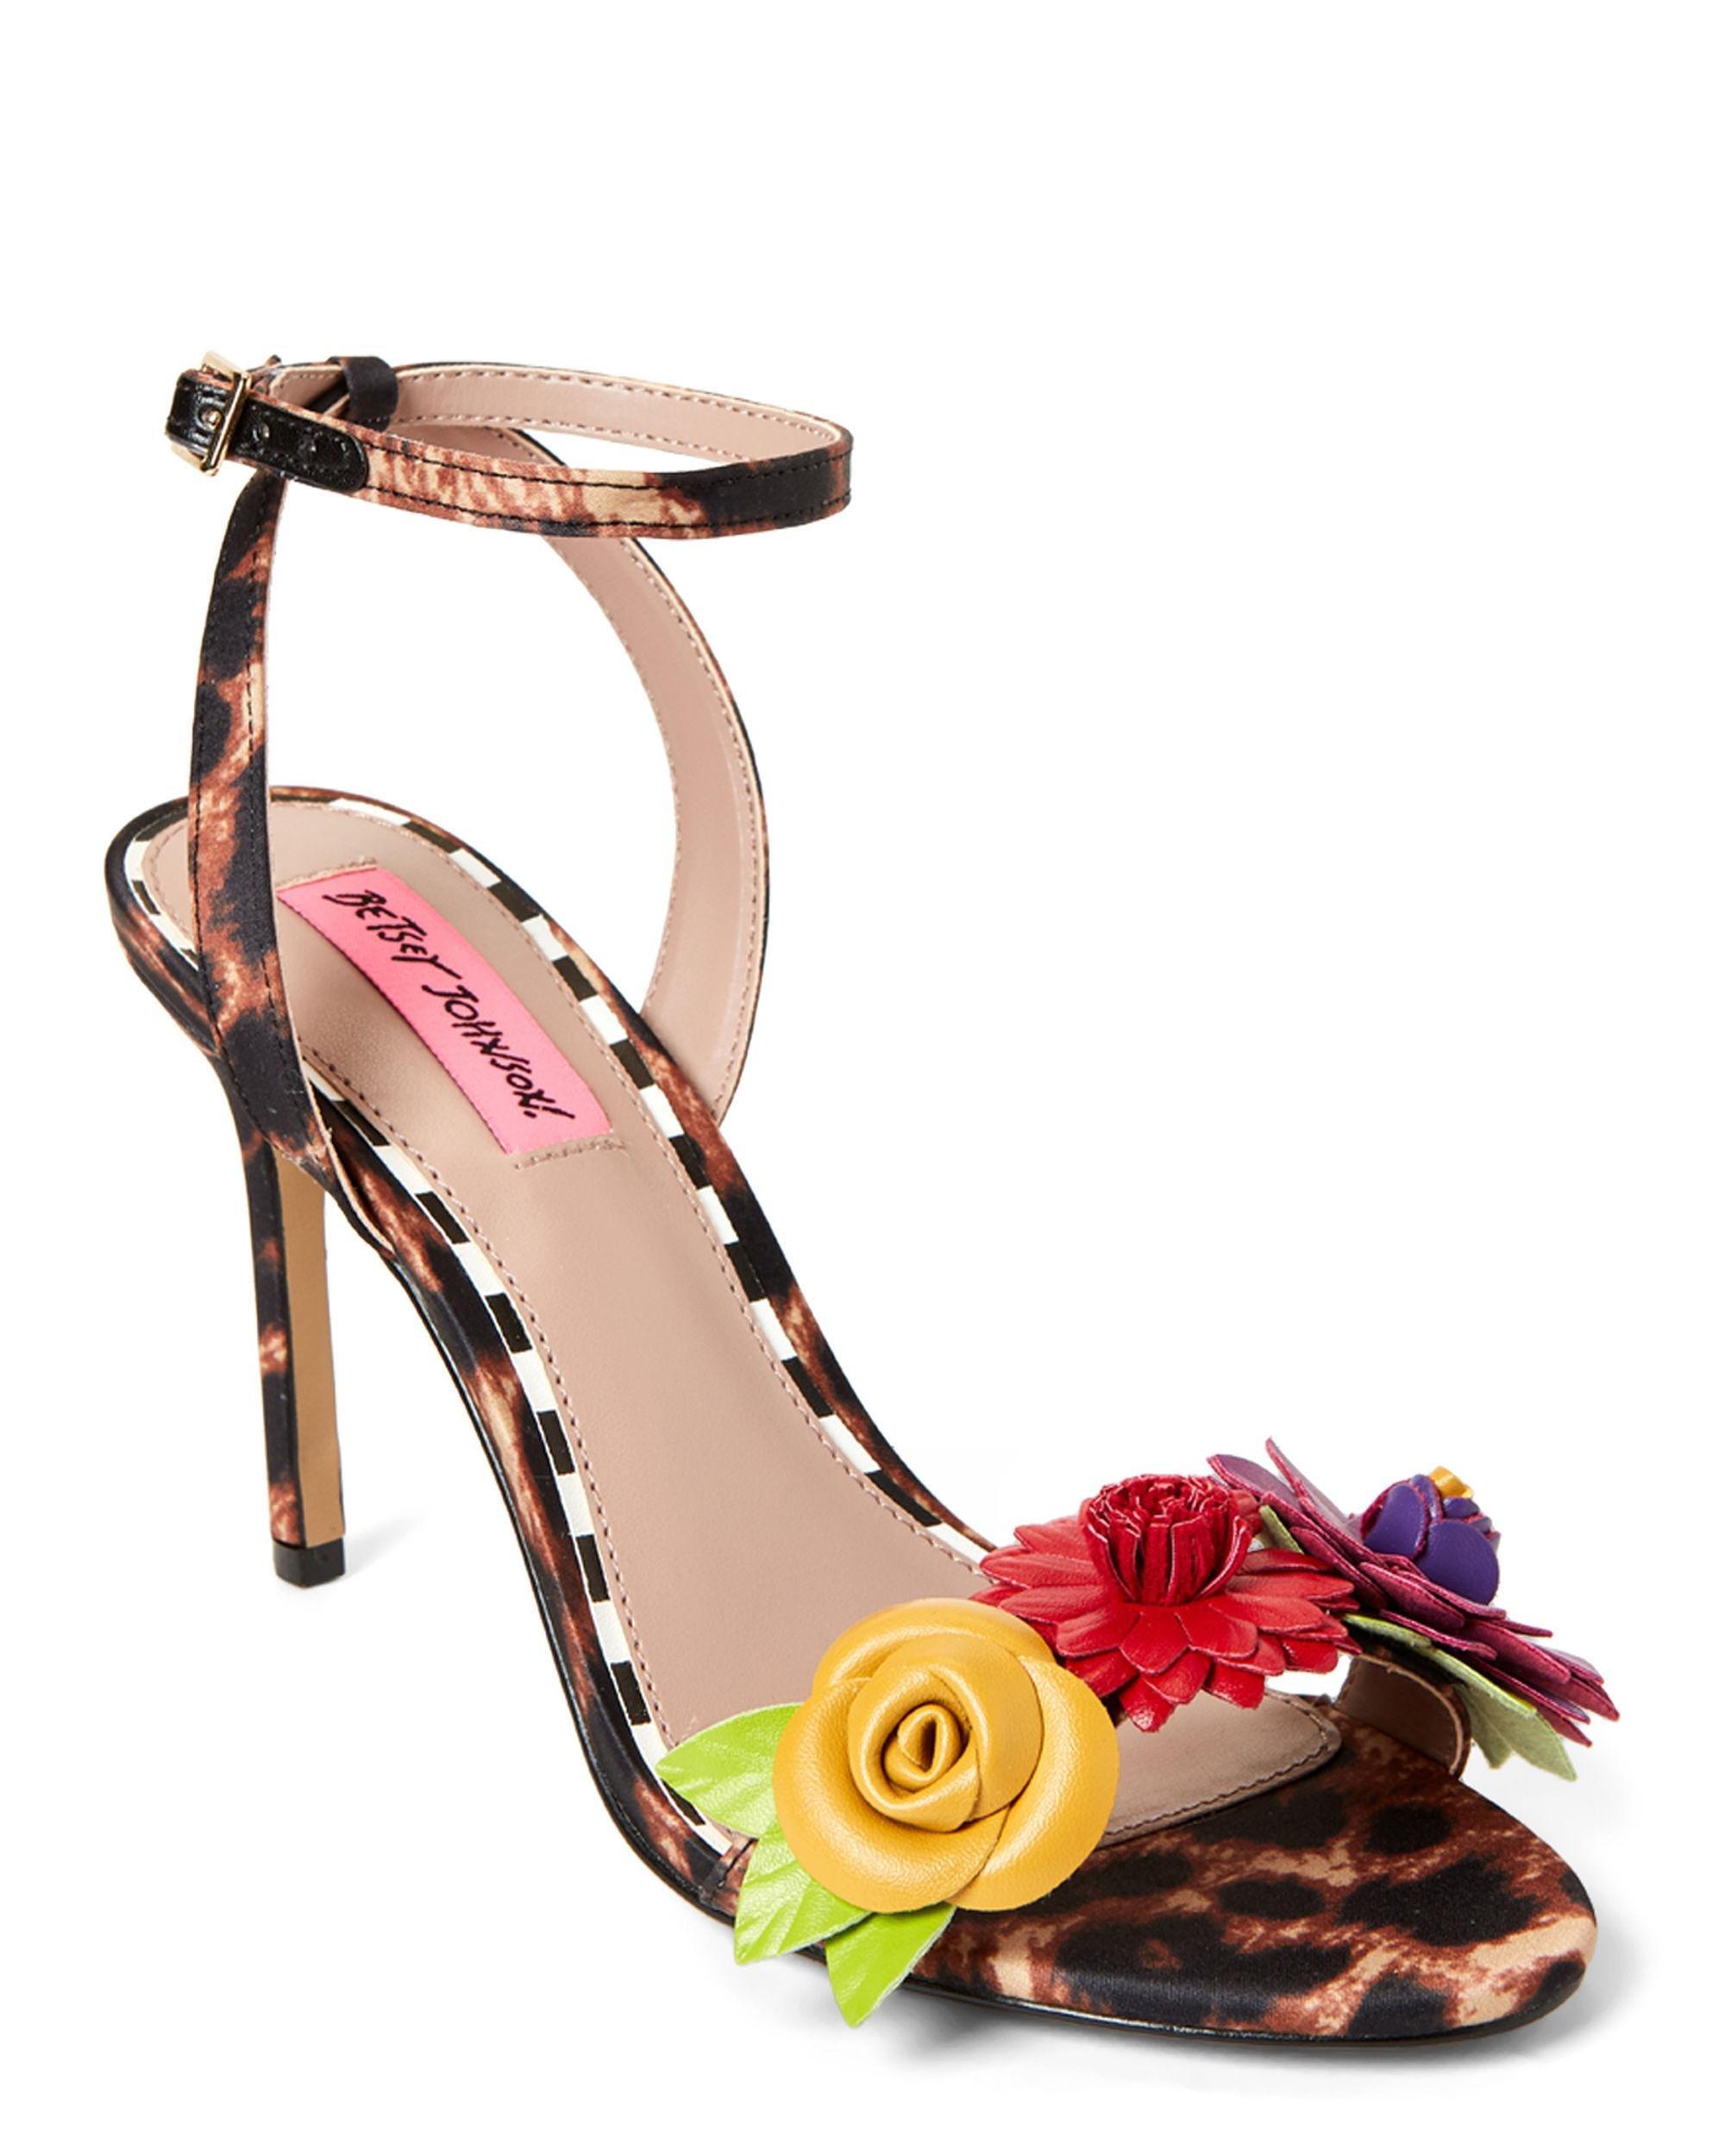 401db0fa4 Lyst - Betsey Johnson Floral Leopard Print Dress Sandals - Save 38%